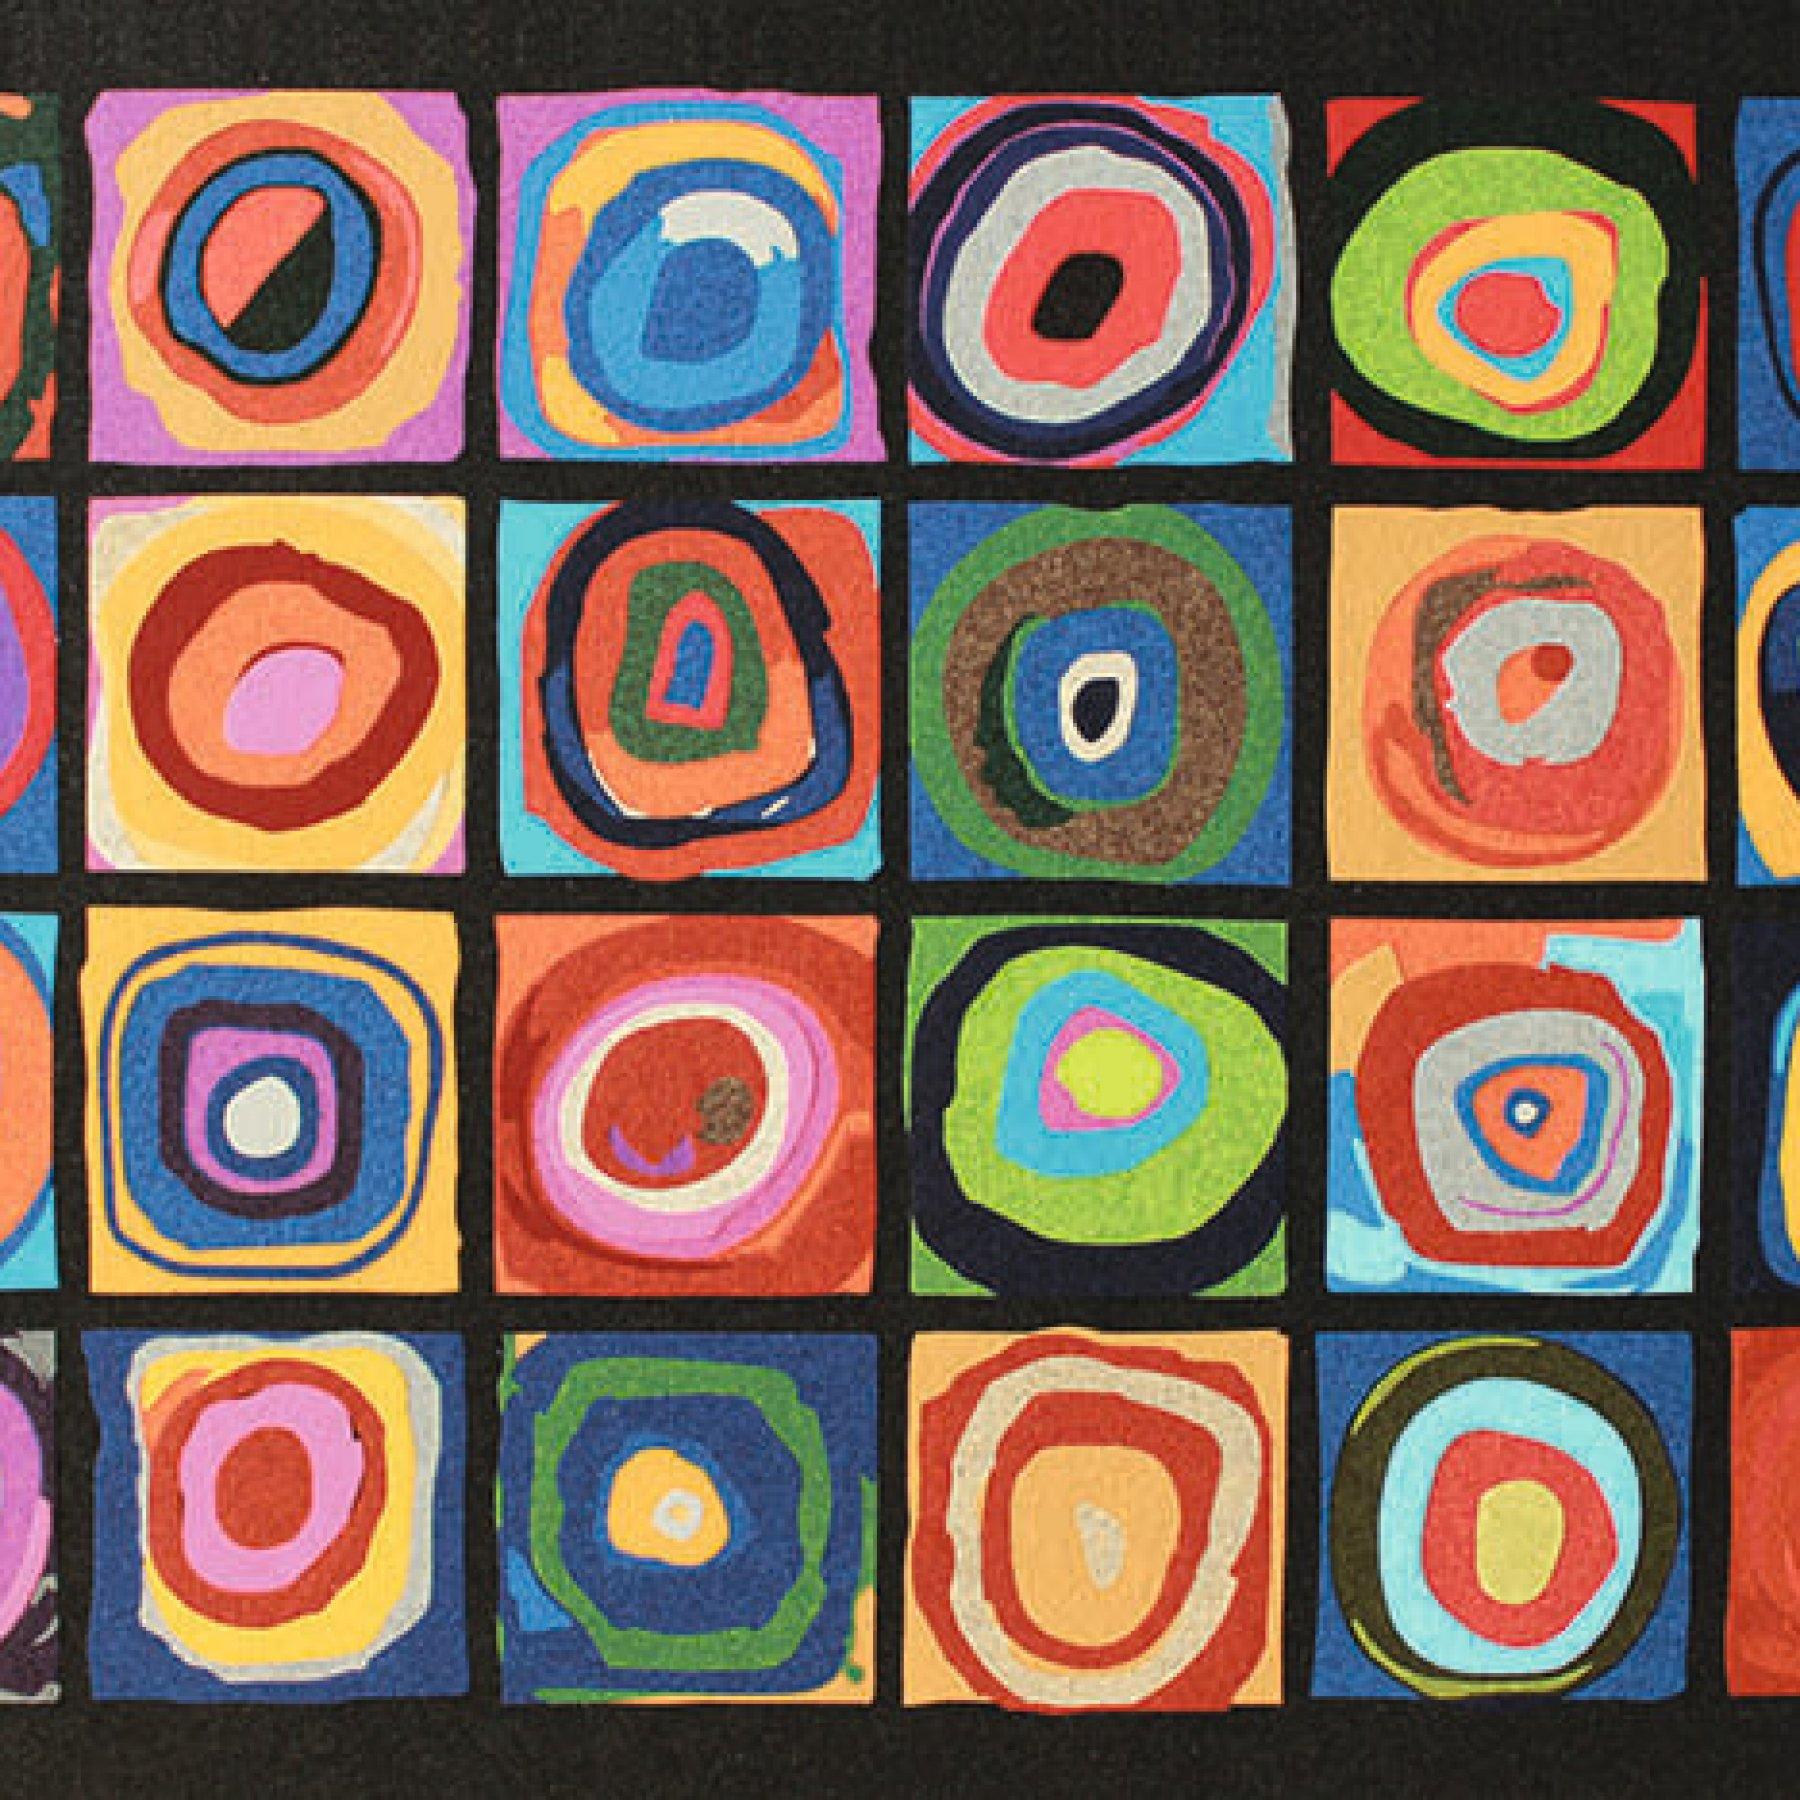 Farbstudie Quadrate | Wassily Kandinsky